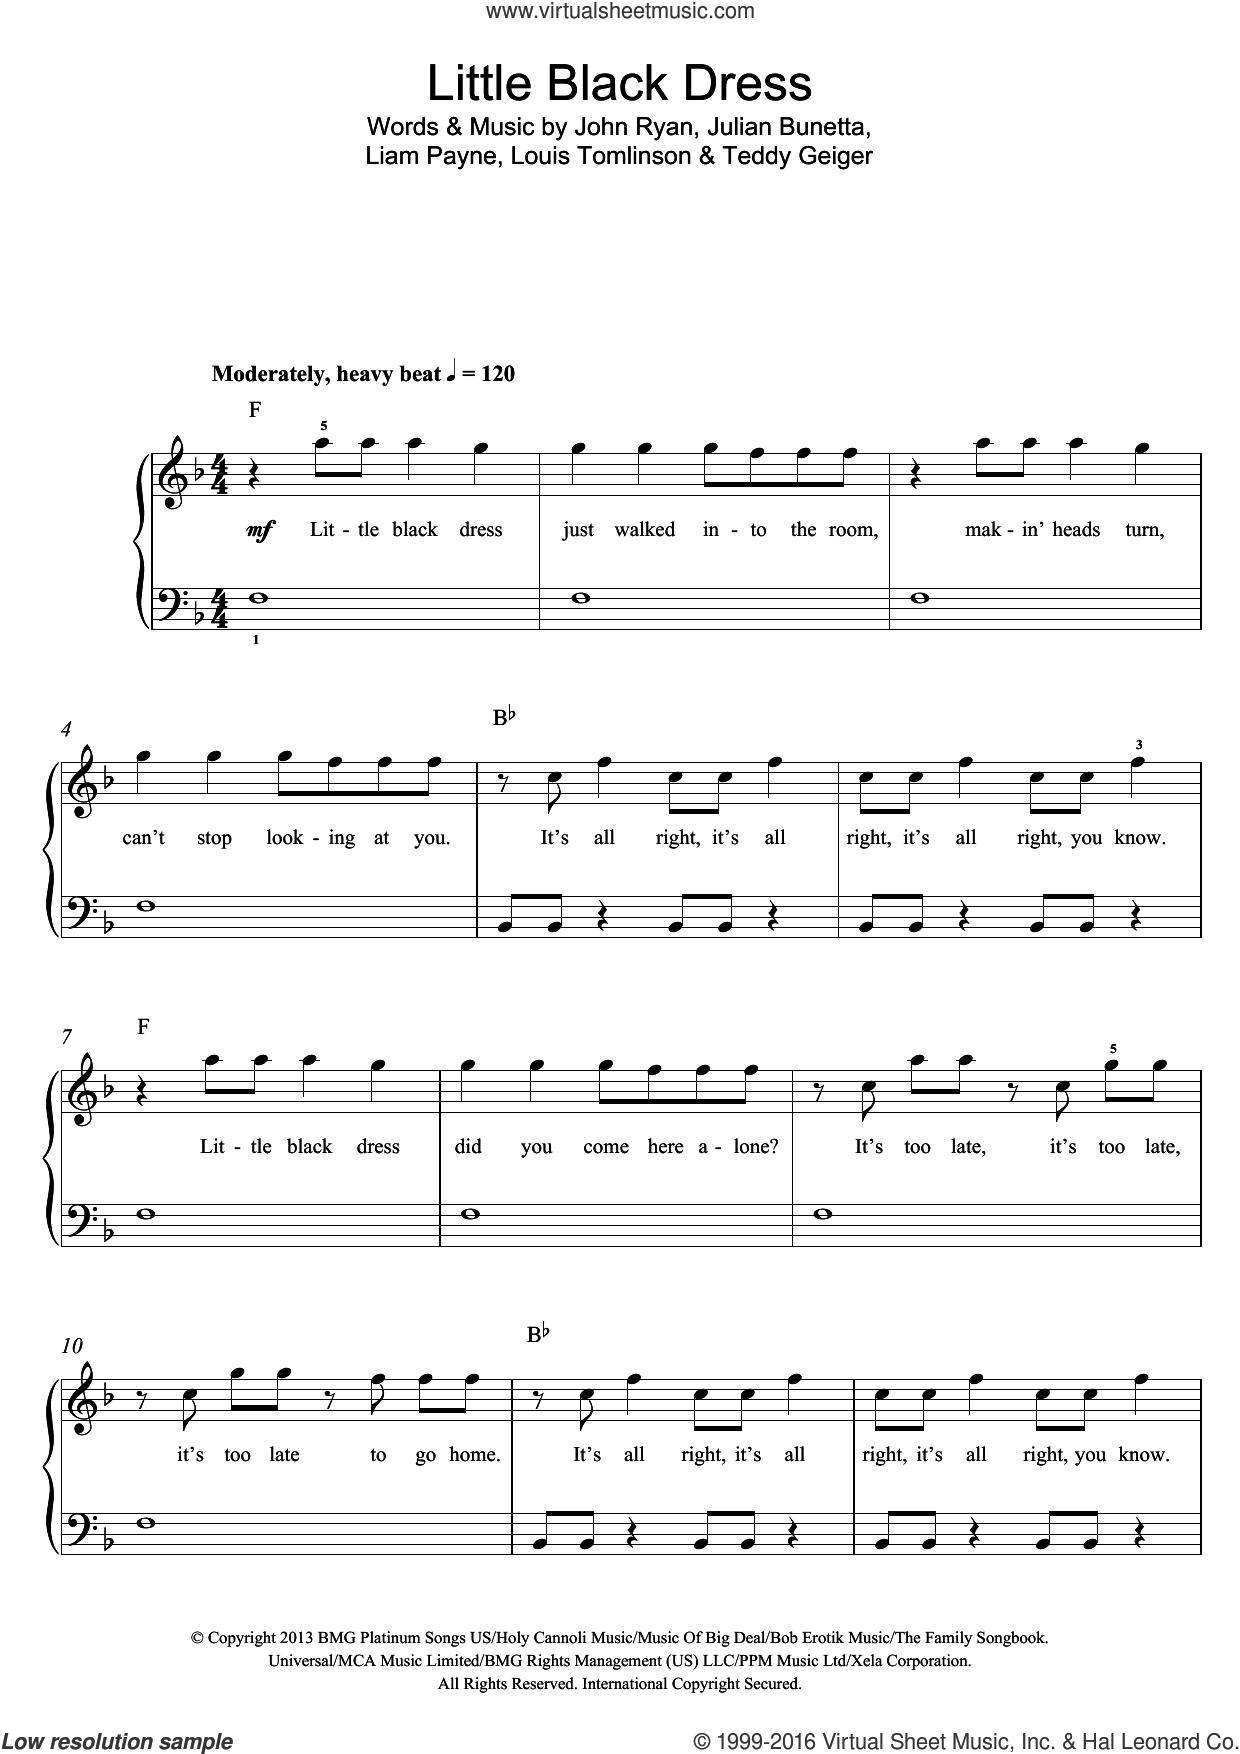 Little Black Dress sheet music for voice, piano or guitar by One Direction, John Ryan, Julian Bunetta, Liam Payne, Louis Tomlinson and Teddy Geiger, intermediate skill level